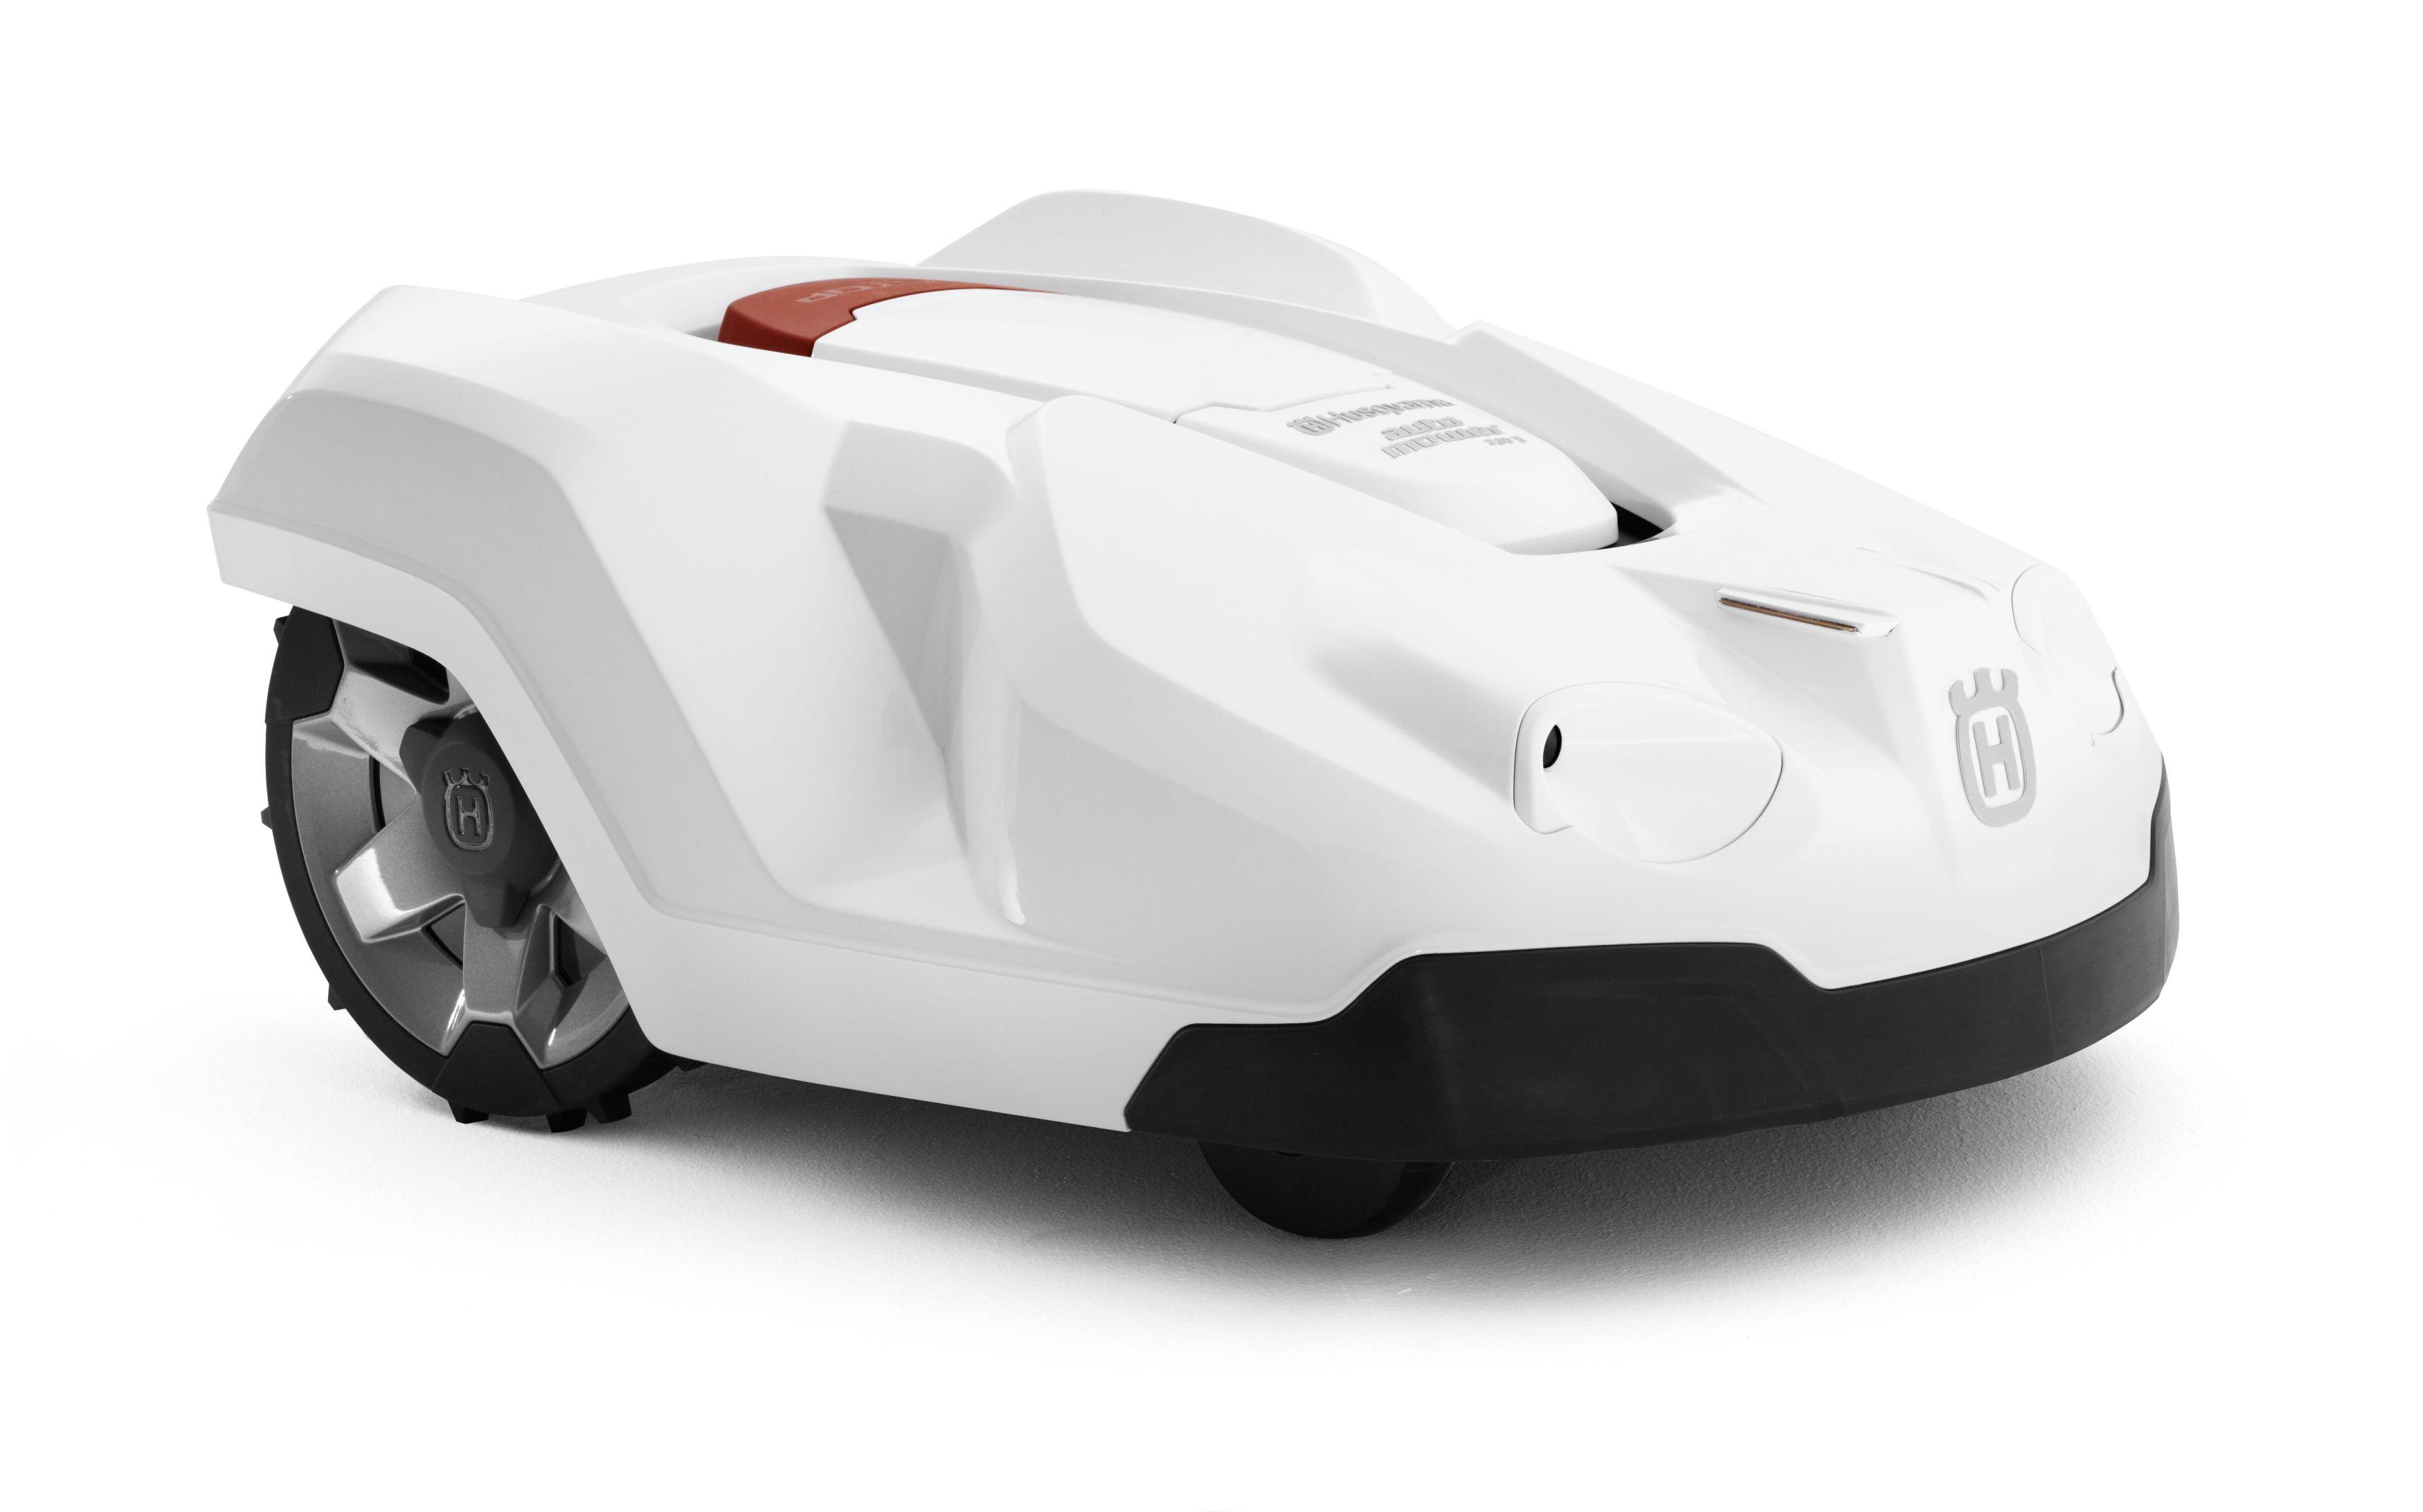 husqvarna automower 330x test complet tondeuse gazon les num riques. Black Bedroom Furniture Sets. Home Design Ideas